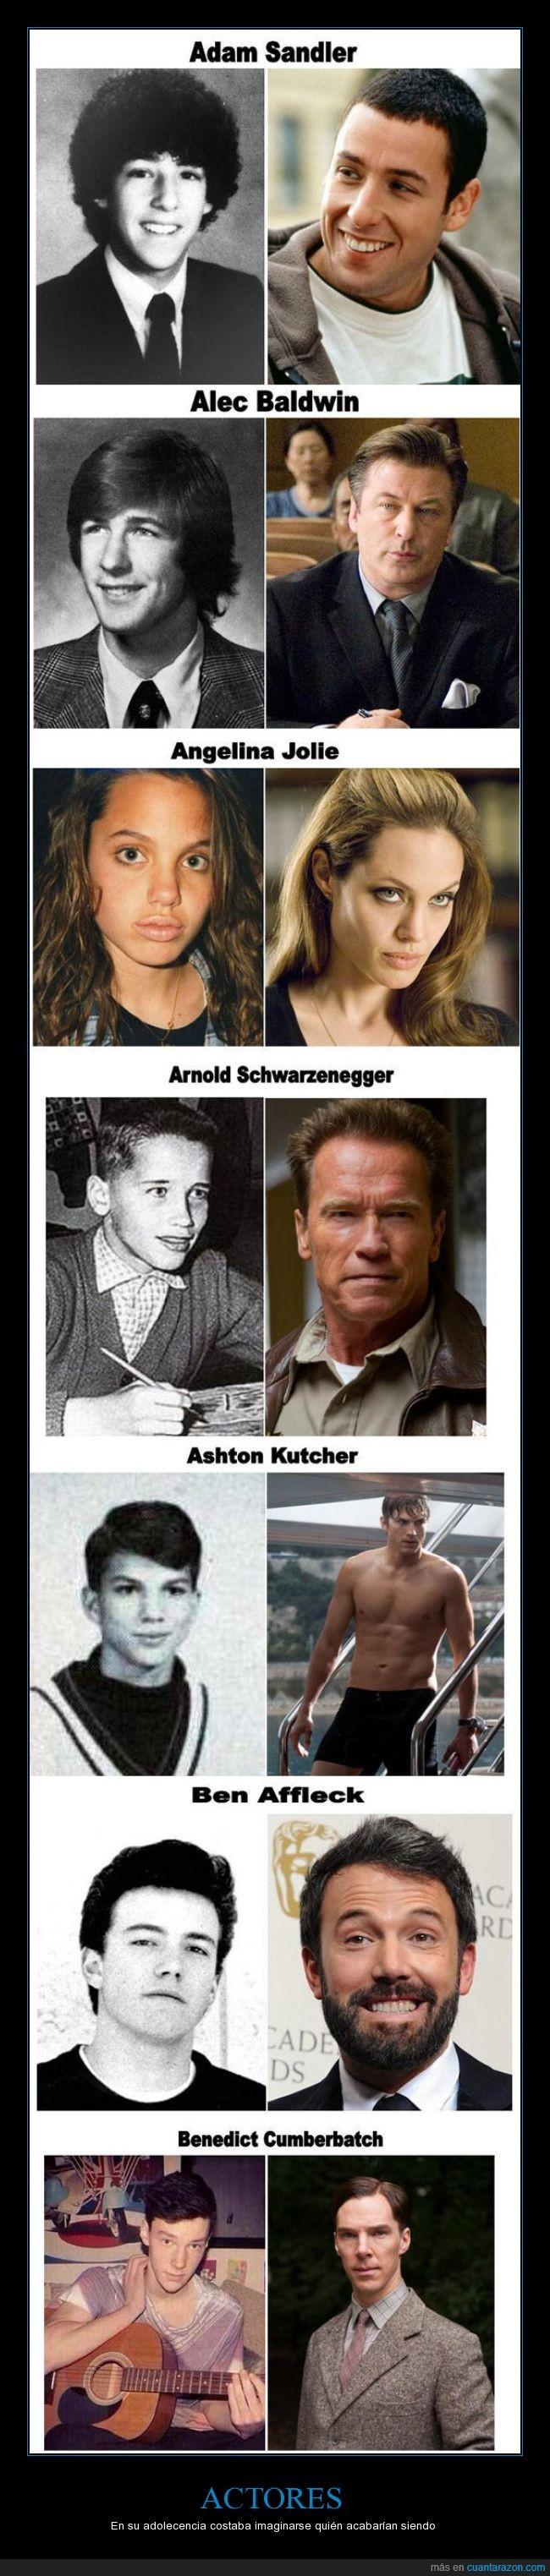 actores jovenes,ashton kutcher schwarzenegger,ben affleck,benedct cumberbach,edad,estrellas,inicios,jolie